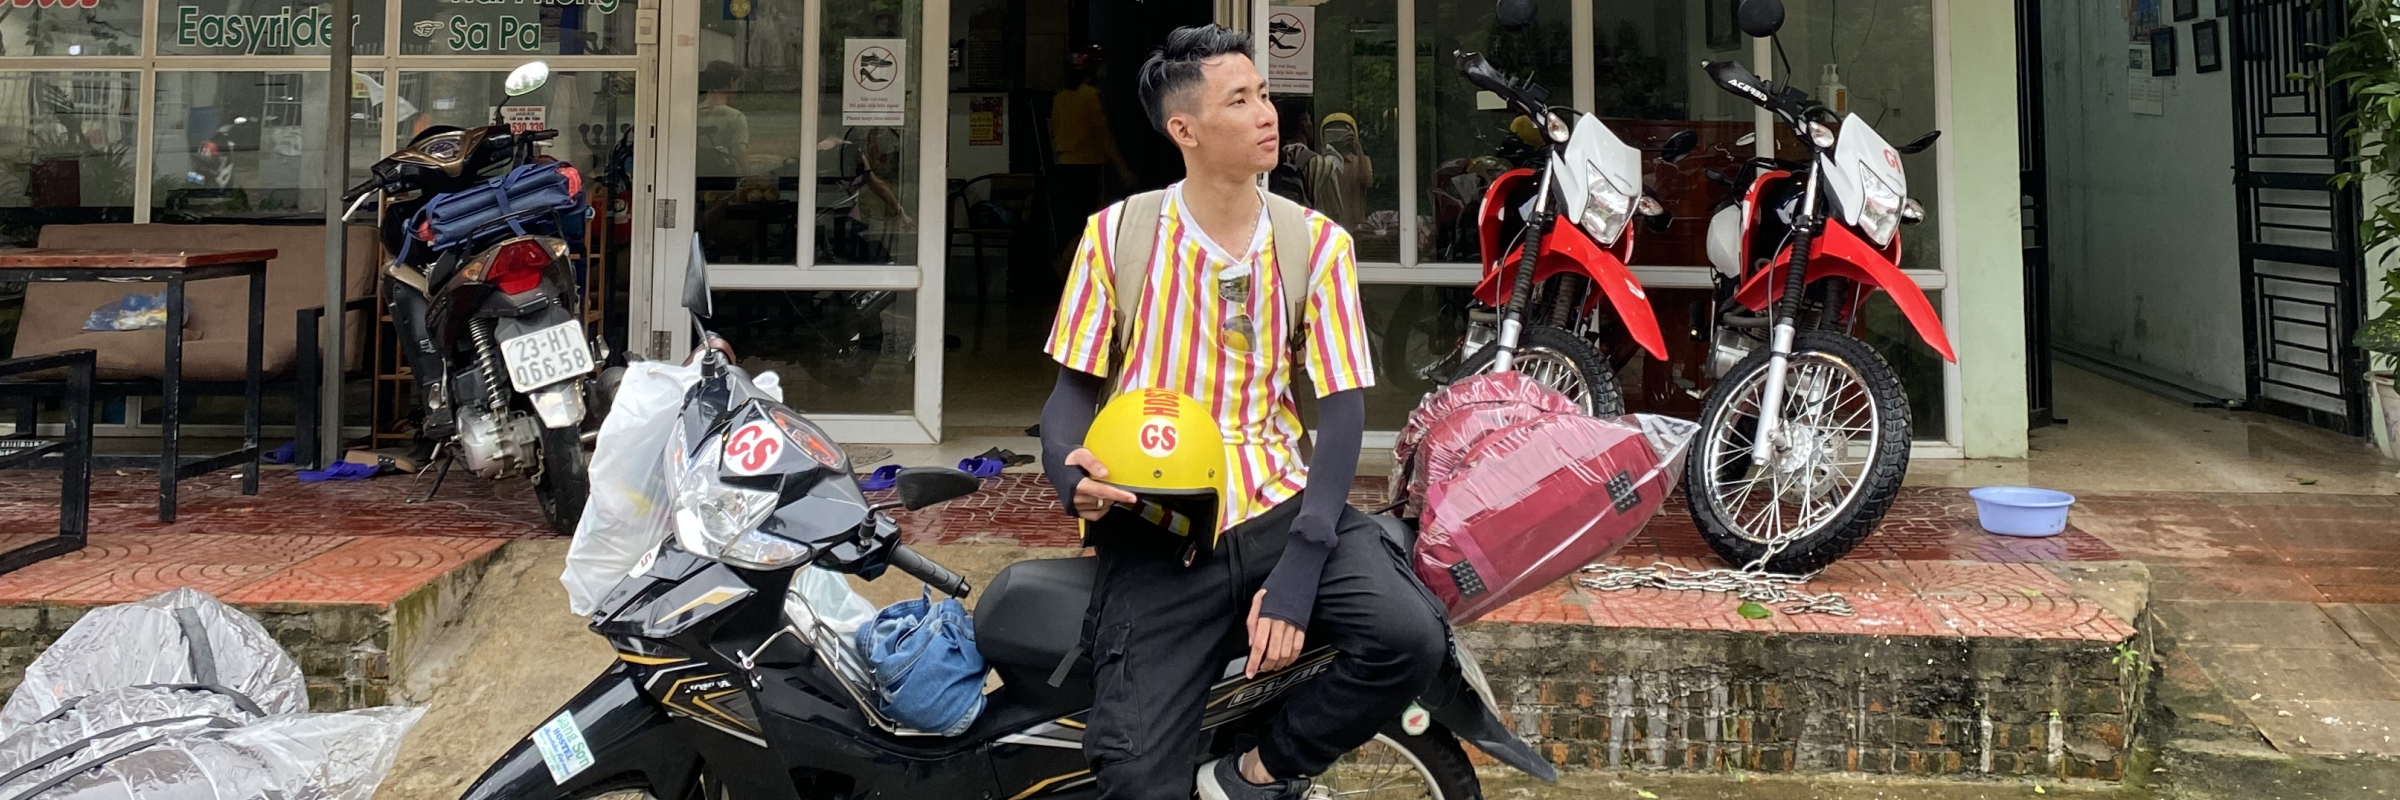 https://gody.vn/blog/trongnguyendo20141965/post/review-thue-xe-may-tai-ha-giang-ban-biet-6890